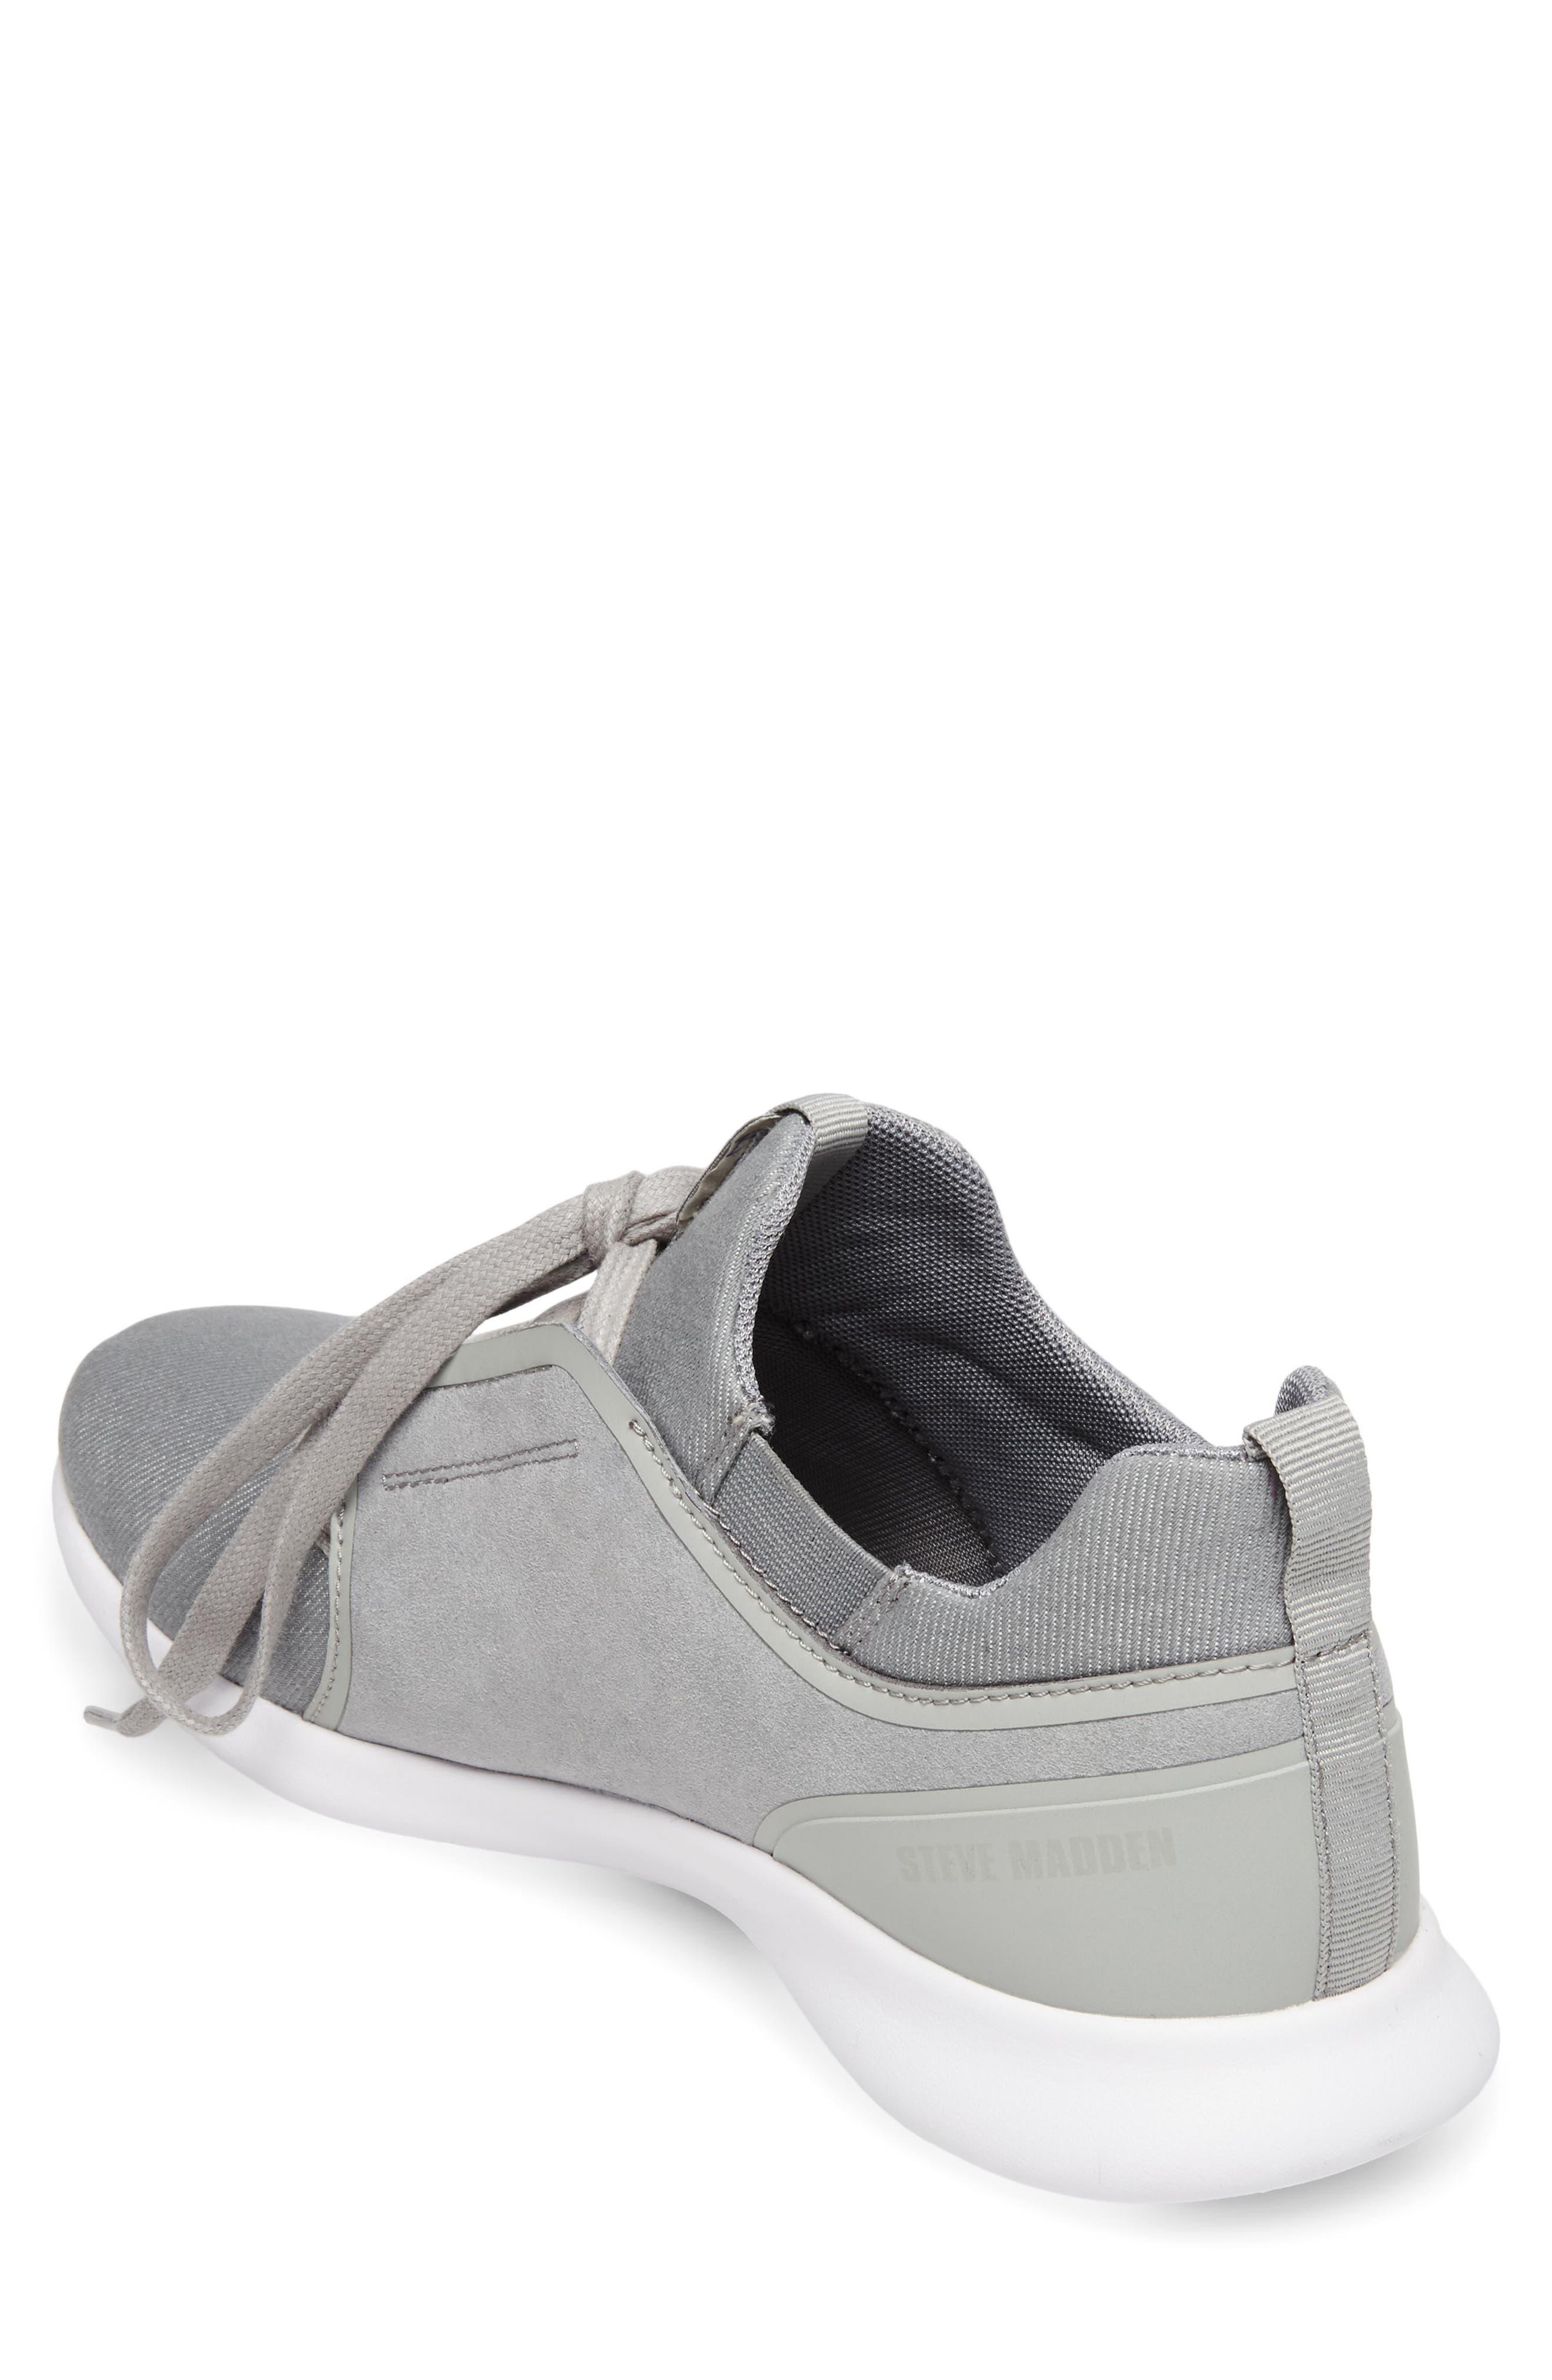 Barrett Sneaker,                             Alternate thumbnail 2, color,                             Grey Leather